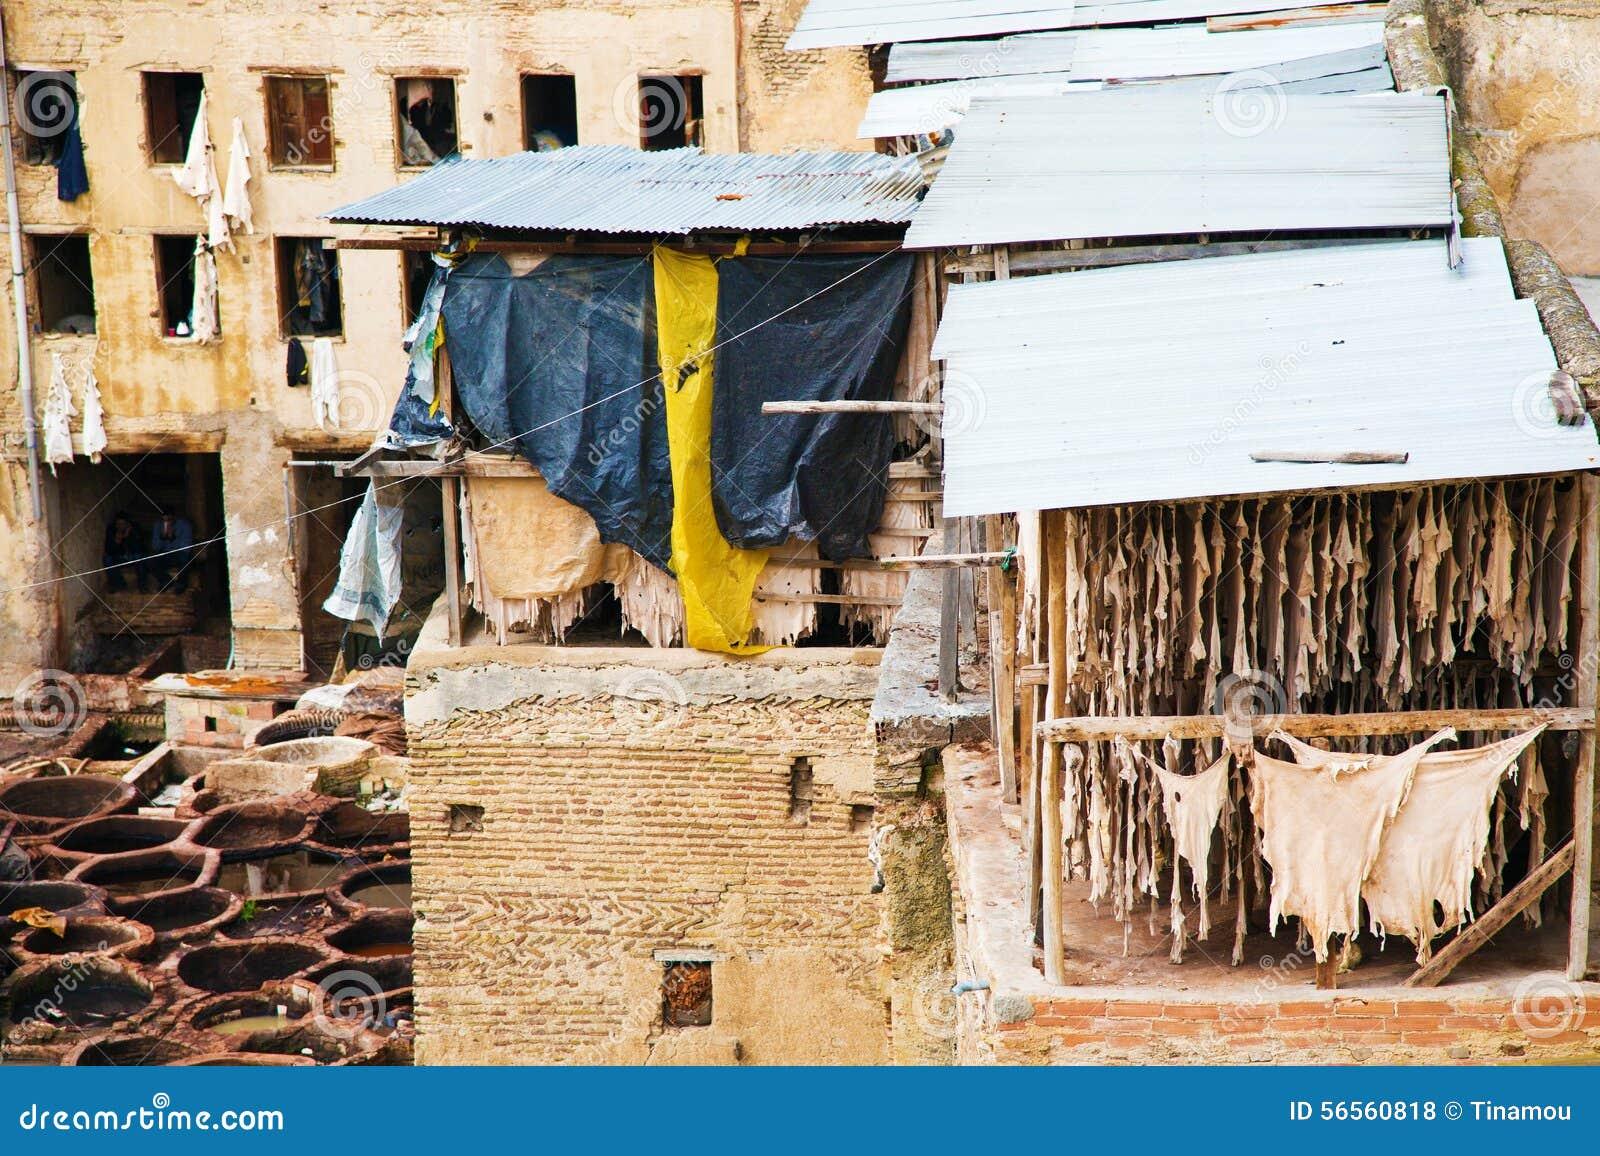 Download Παλαιός φλοιός στο Fez, Μαρόκο Εκδοτική Στοκ Εικόνες - εικόνα από antiquate, αφρικανικά: 56560818